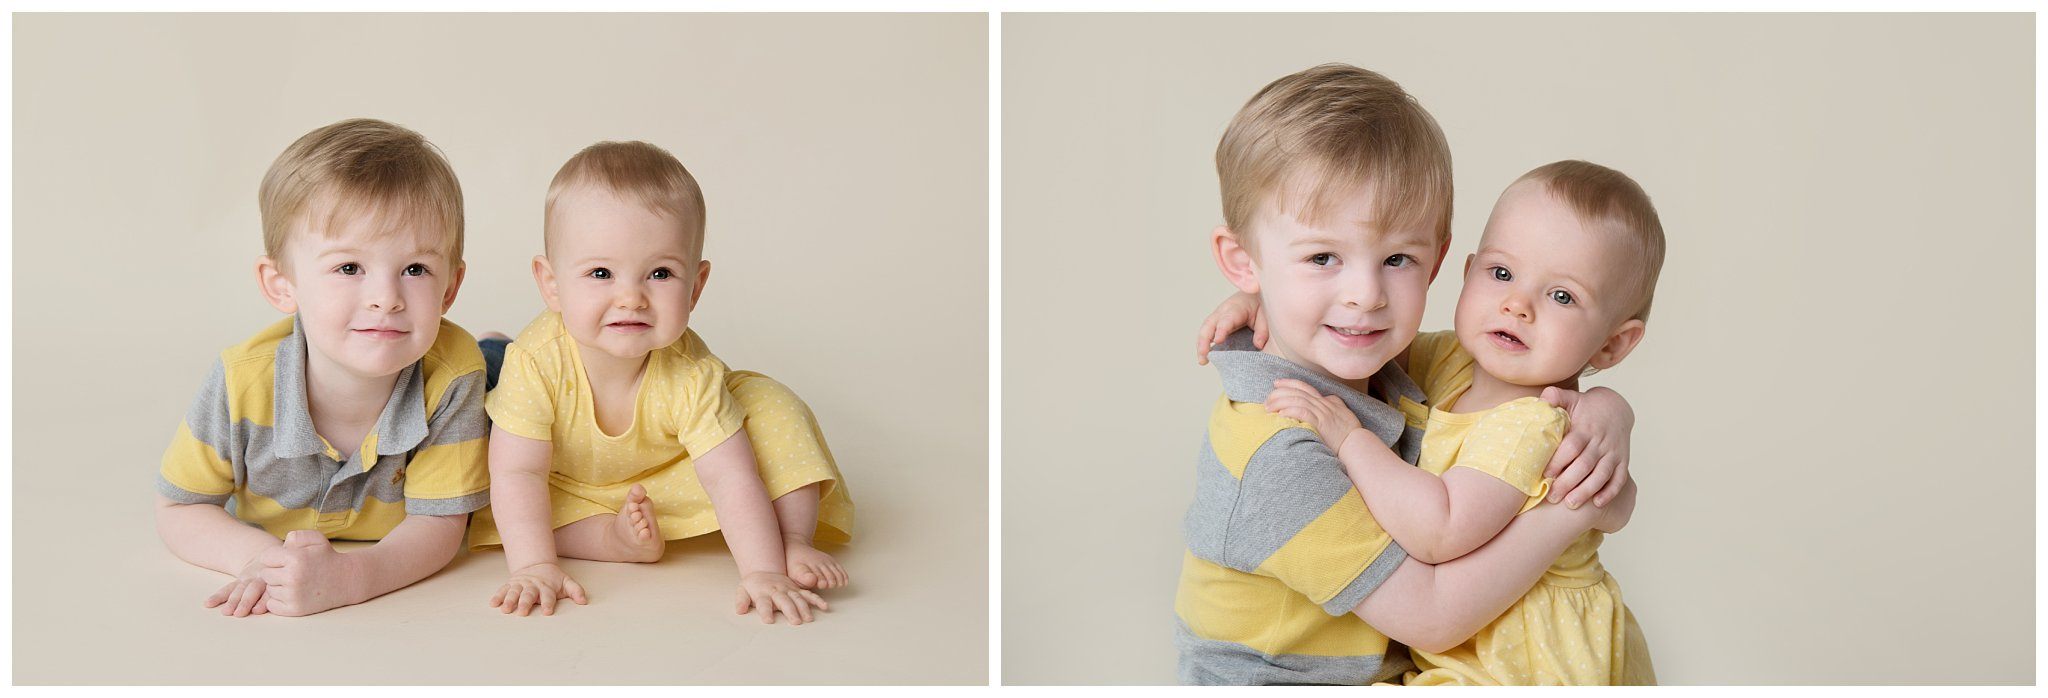 Tiny Baby Studio Newcastle Newborn Photographer Siblings First Birthday